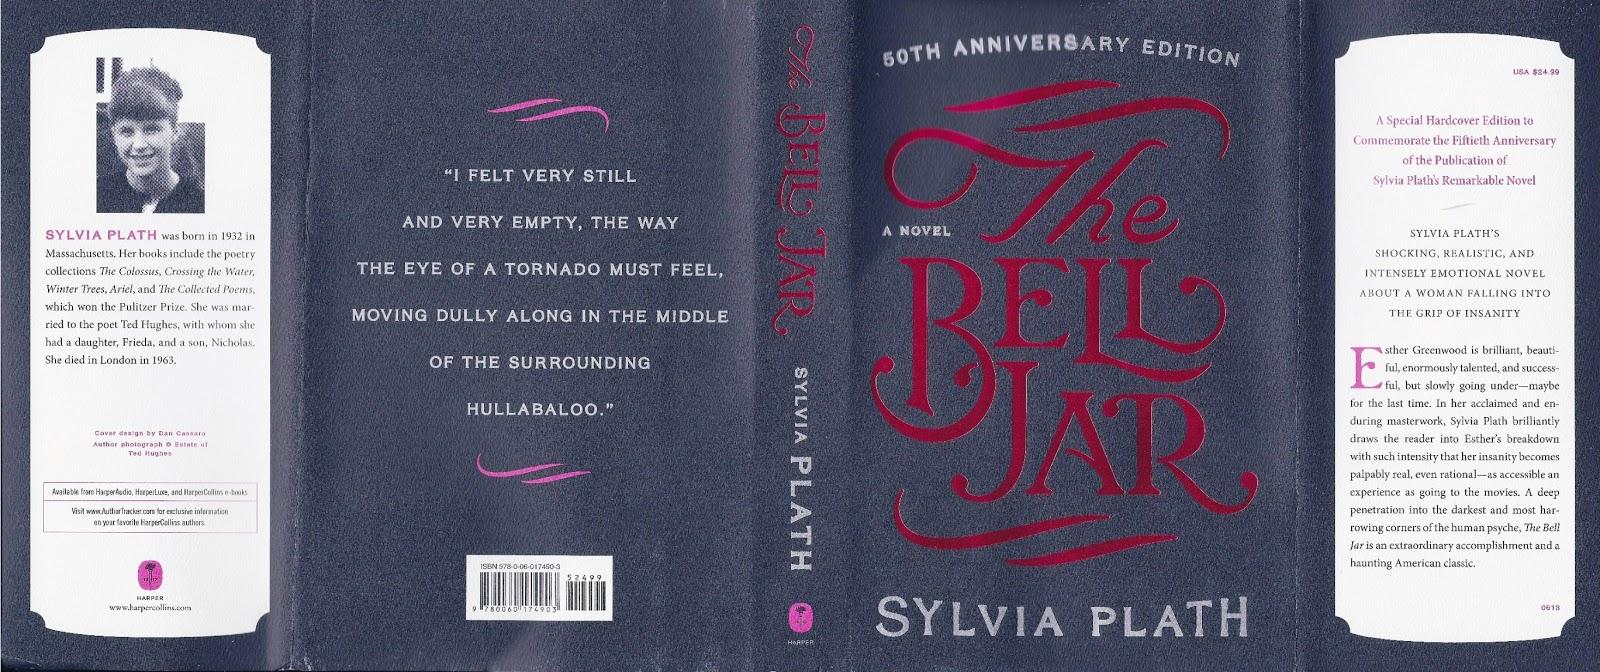 the bell jar essay sylvia plath info harper publishes th  the bell jar essay harper publishes 50th anniversary edition of sylvia plath s the bell jar